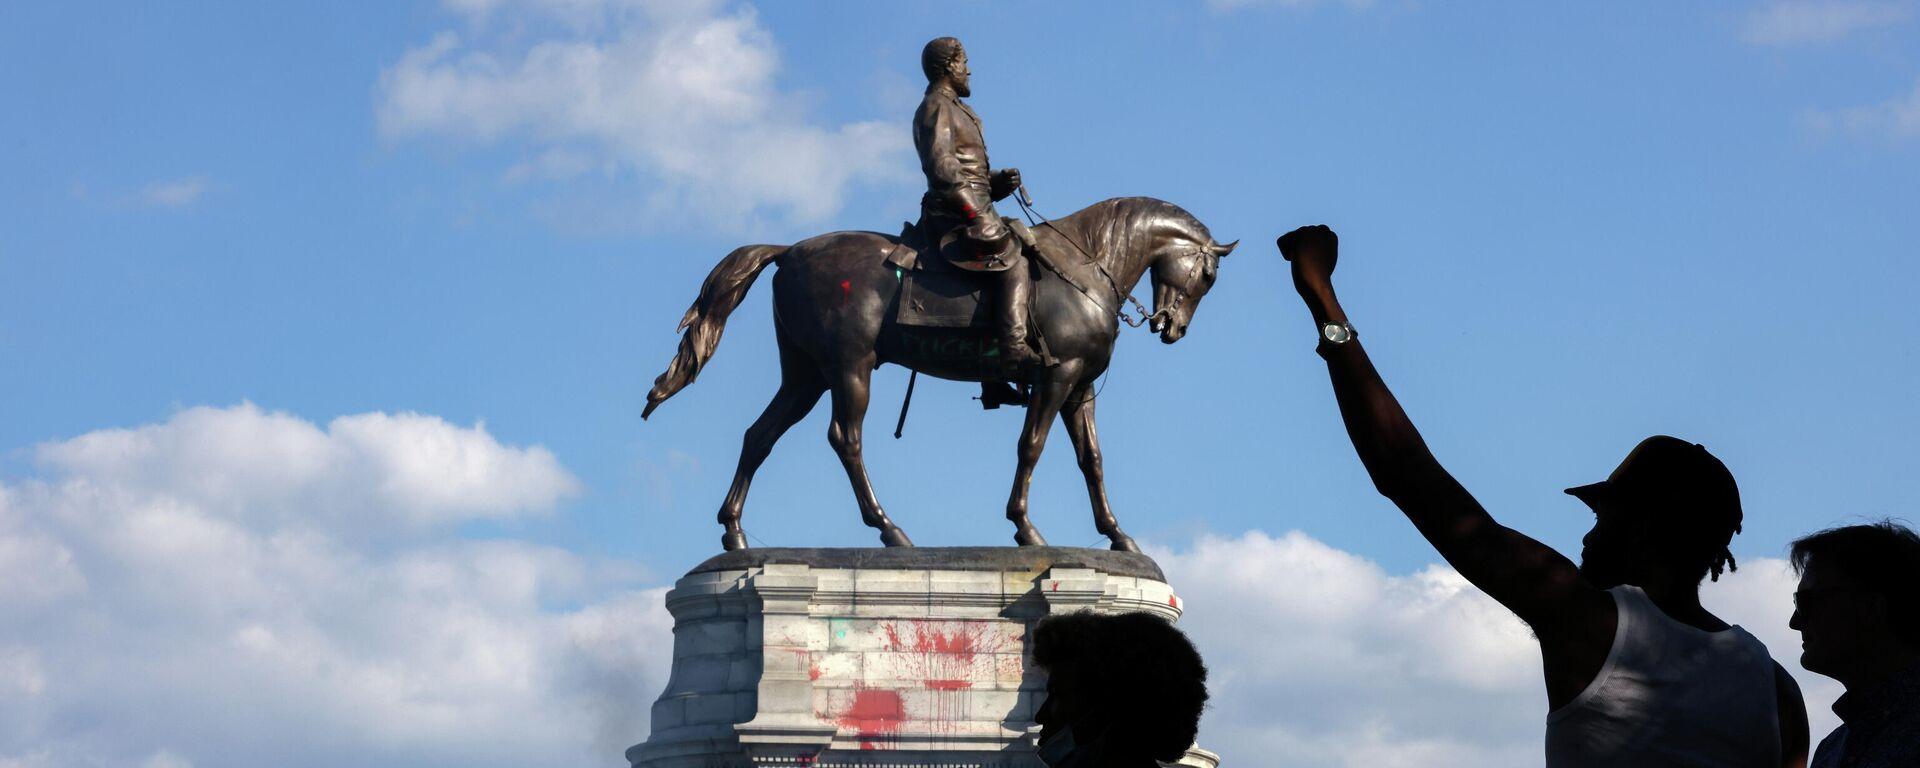 La estatua del general confederado Robert E. Lee en Virginia, EEUU - Sputnik Mundo, 1920, 08.09.2021